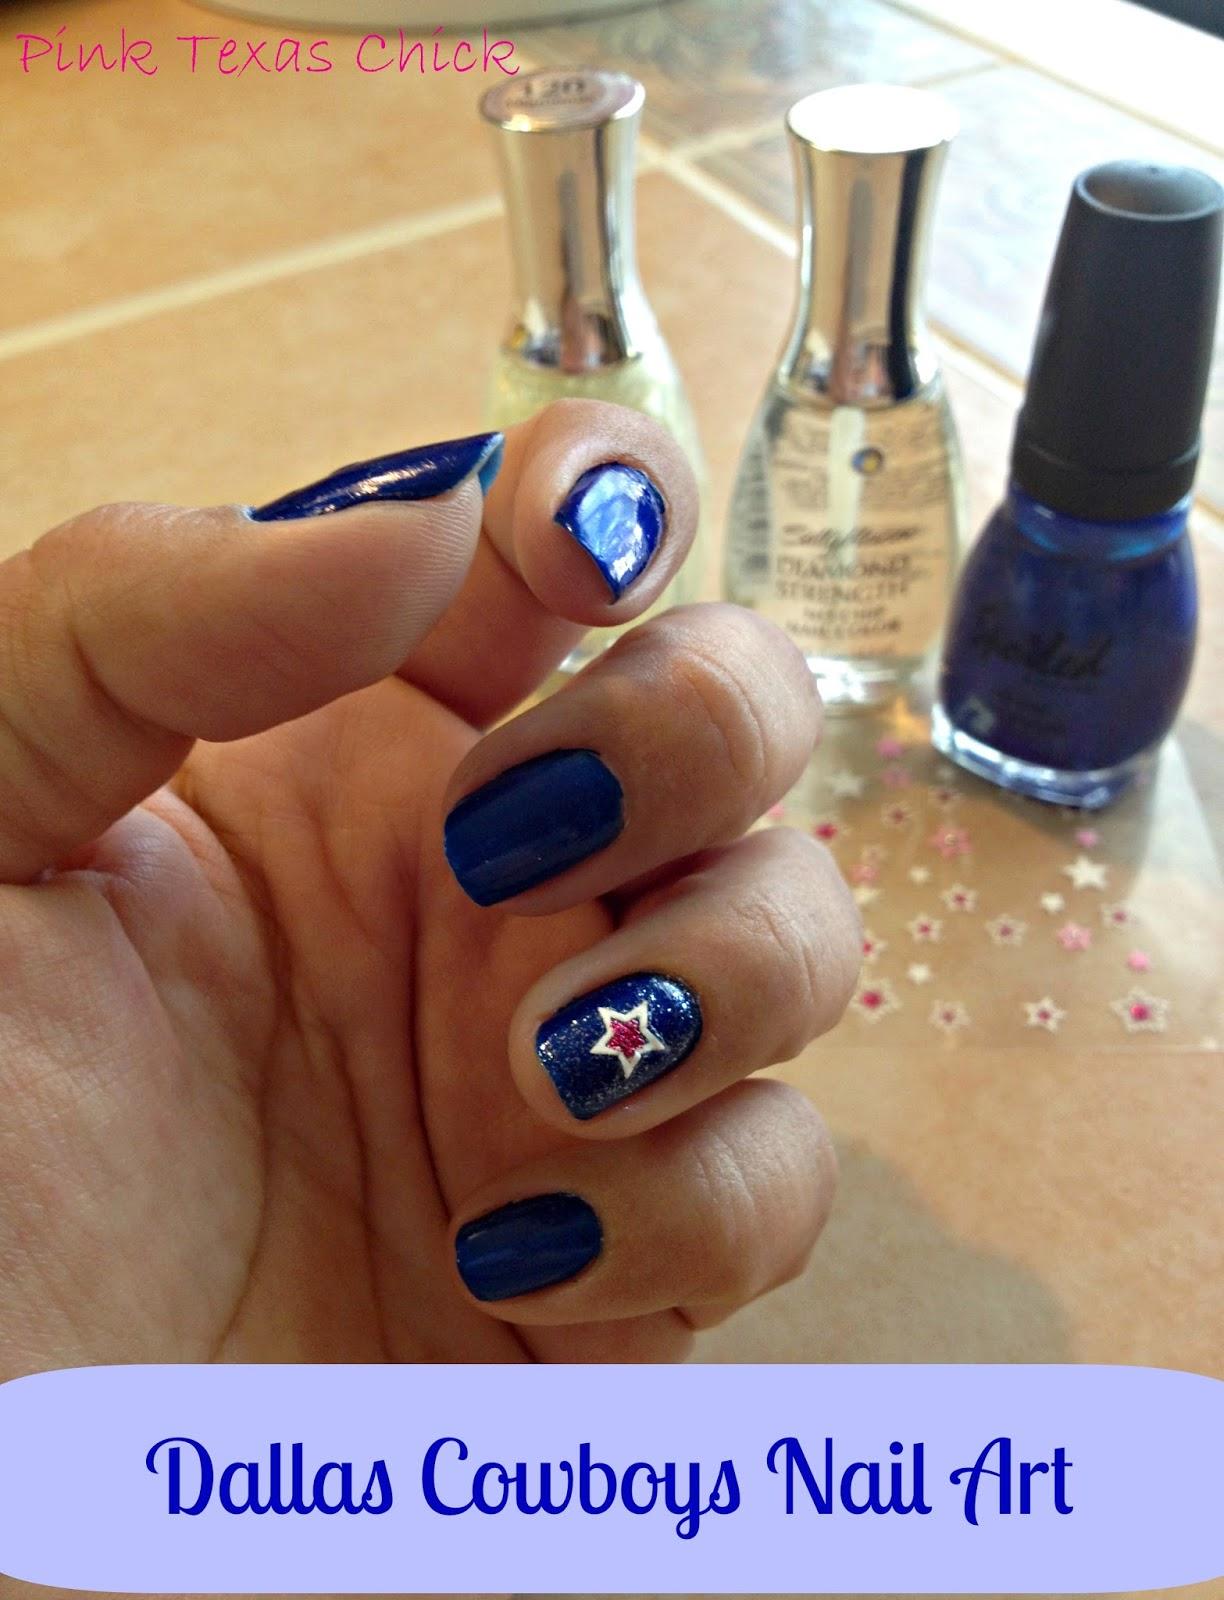 My dallas cowboys nail art pink texas chick prinsesfo Image collections